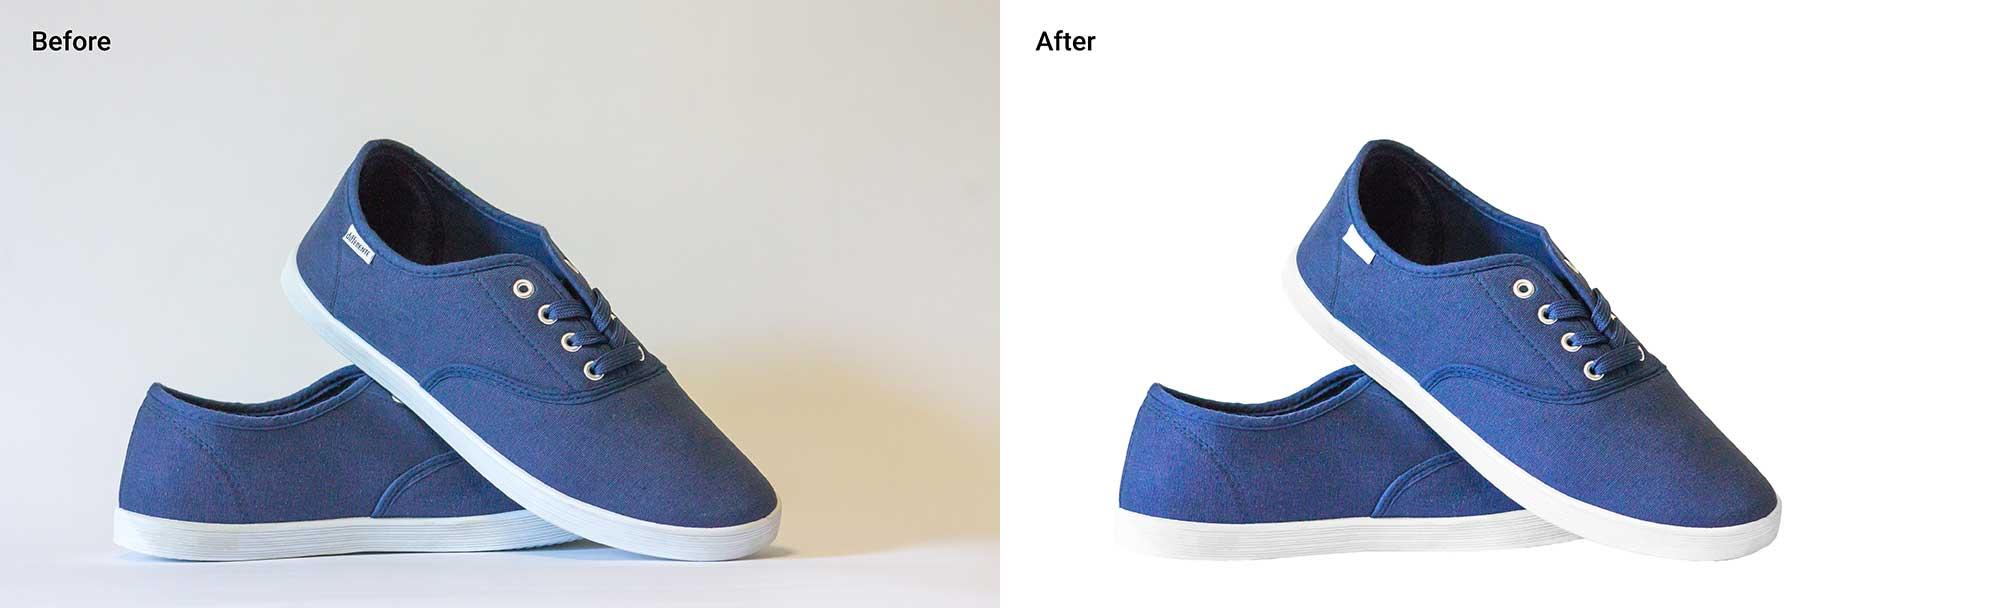 mens-footwear-product editing